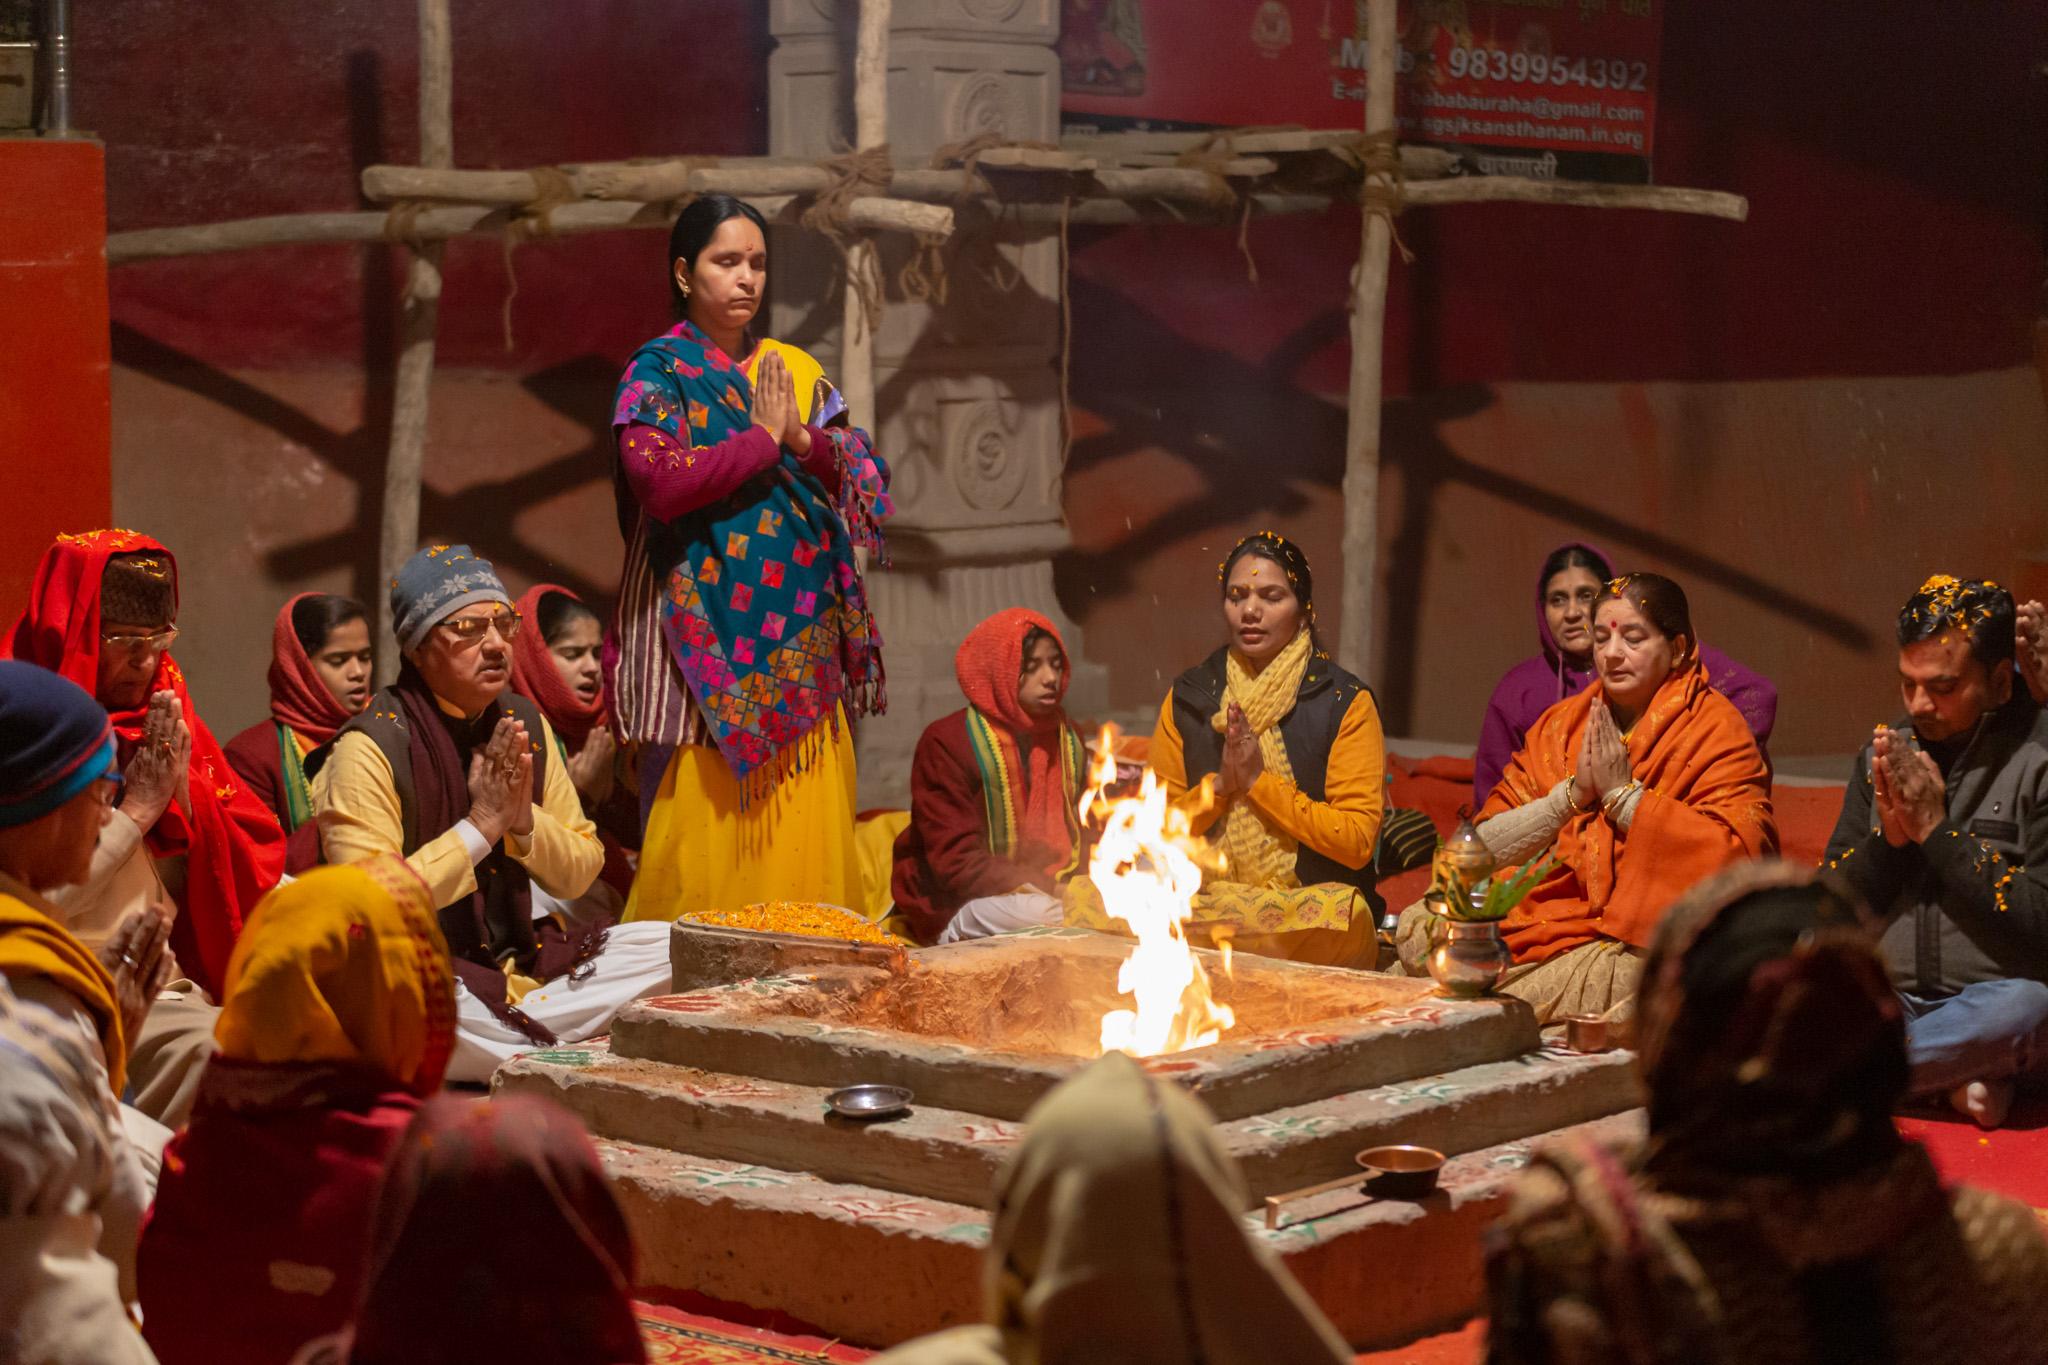 Ceremony around fireplace in Varanasi, India.